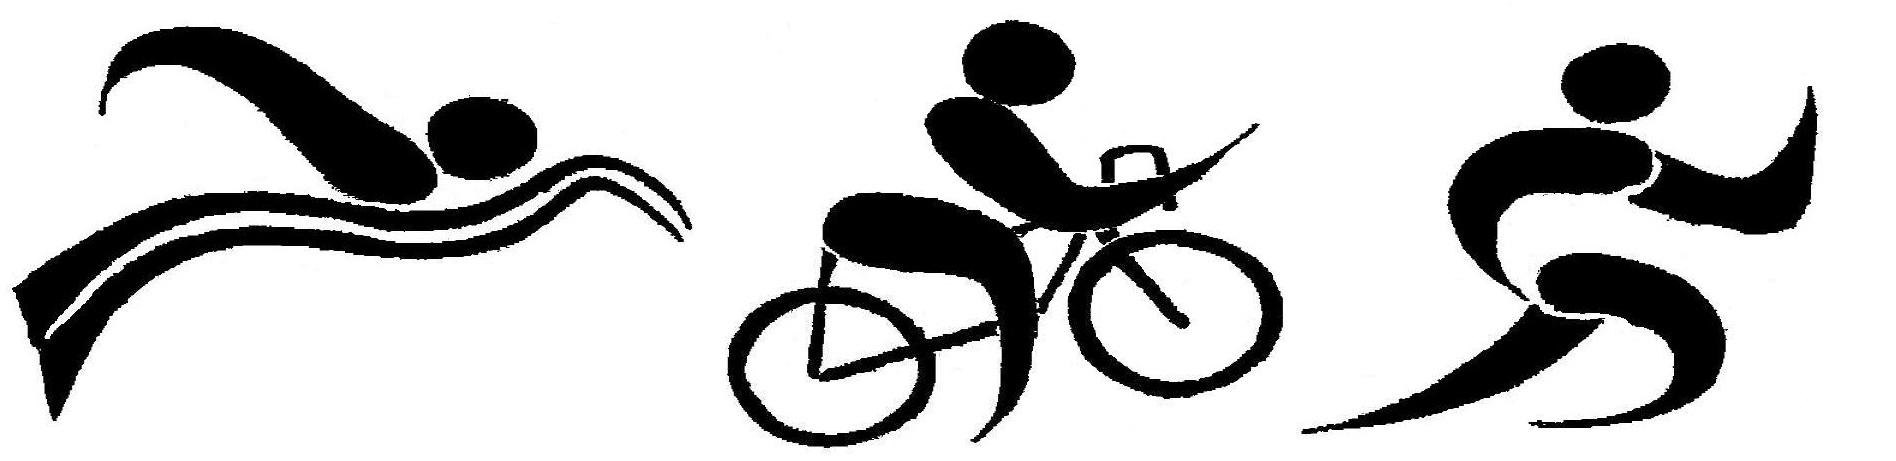 Leapfrog  Mini S  Triathlon Training Bike Skills   Practice